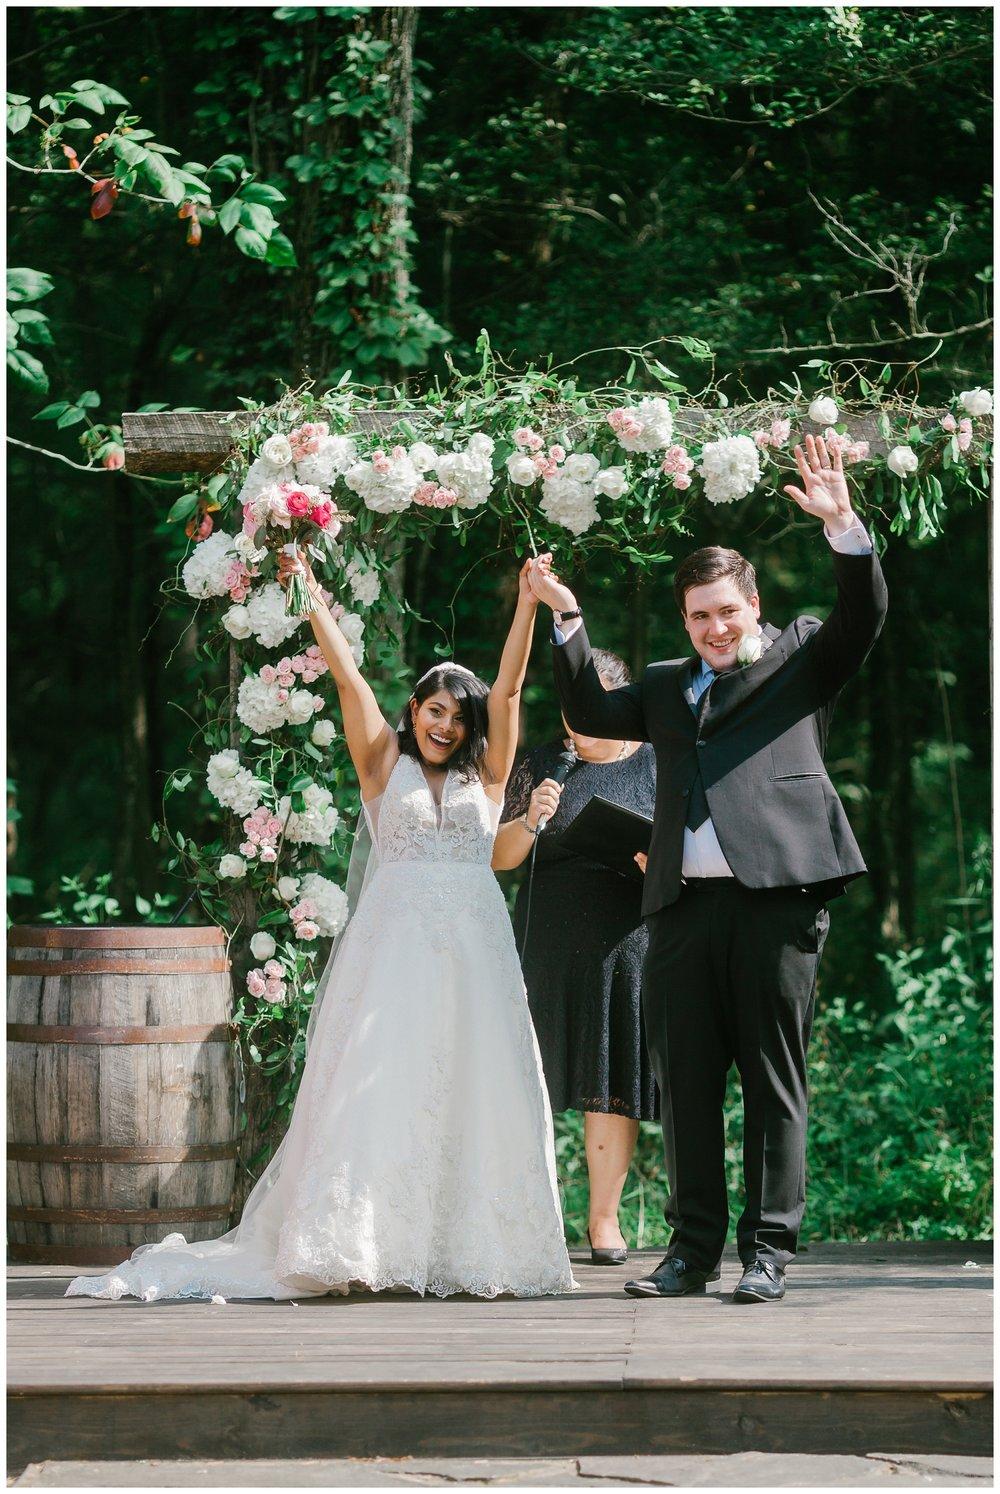 Rebecca_Bridges_Photography_Indianapolis_Wedding_Photographer_6950.jpg